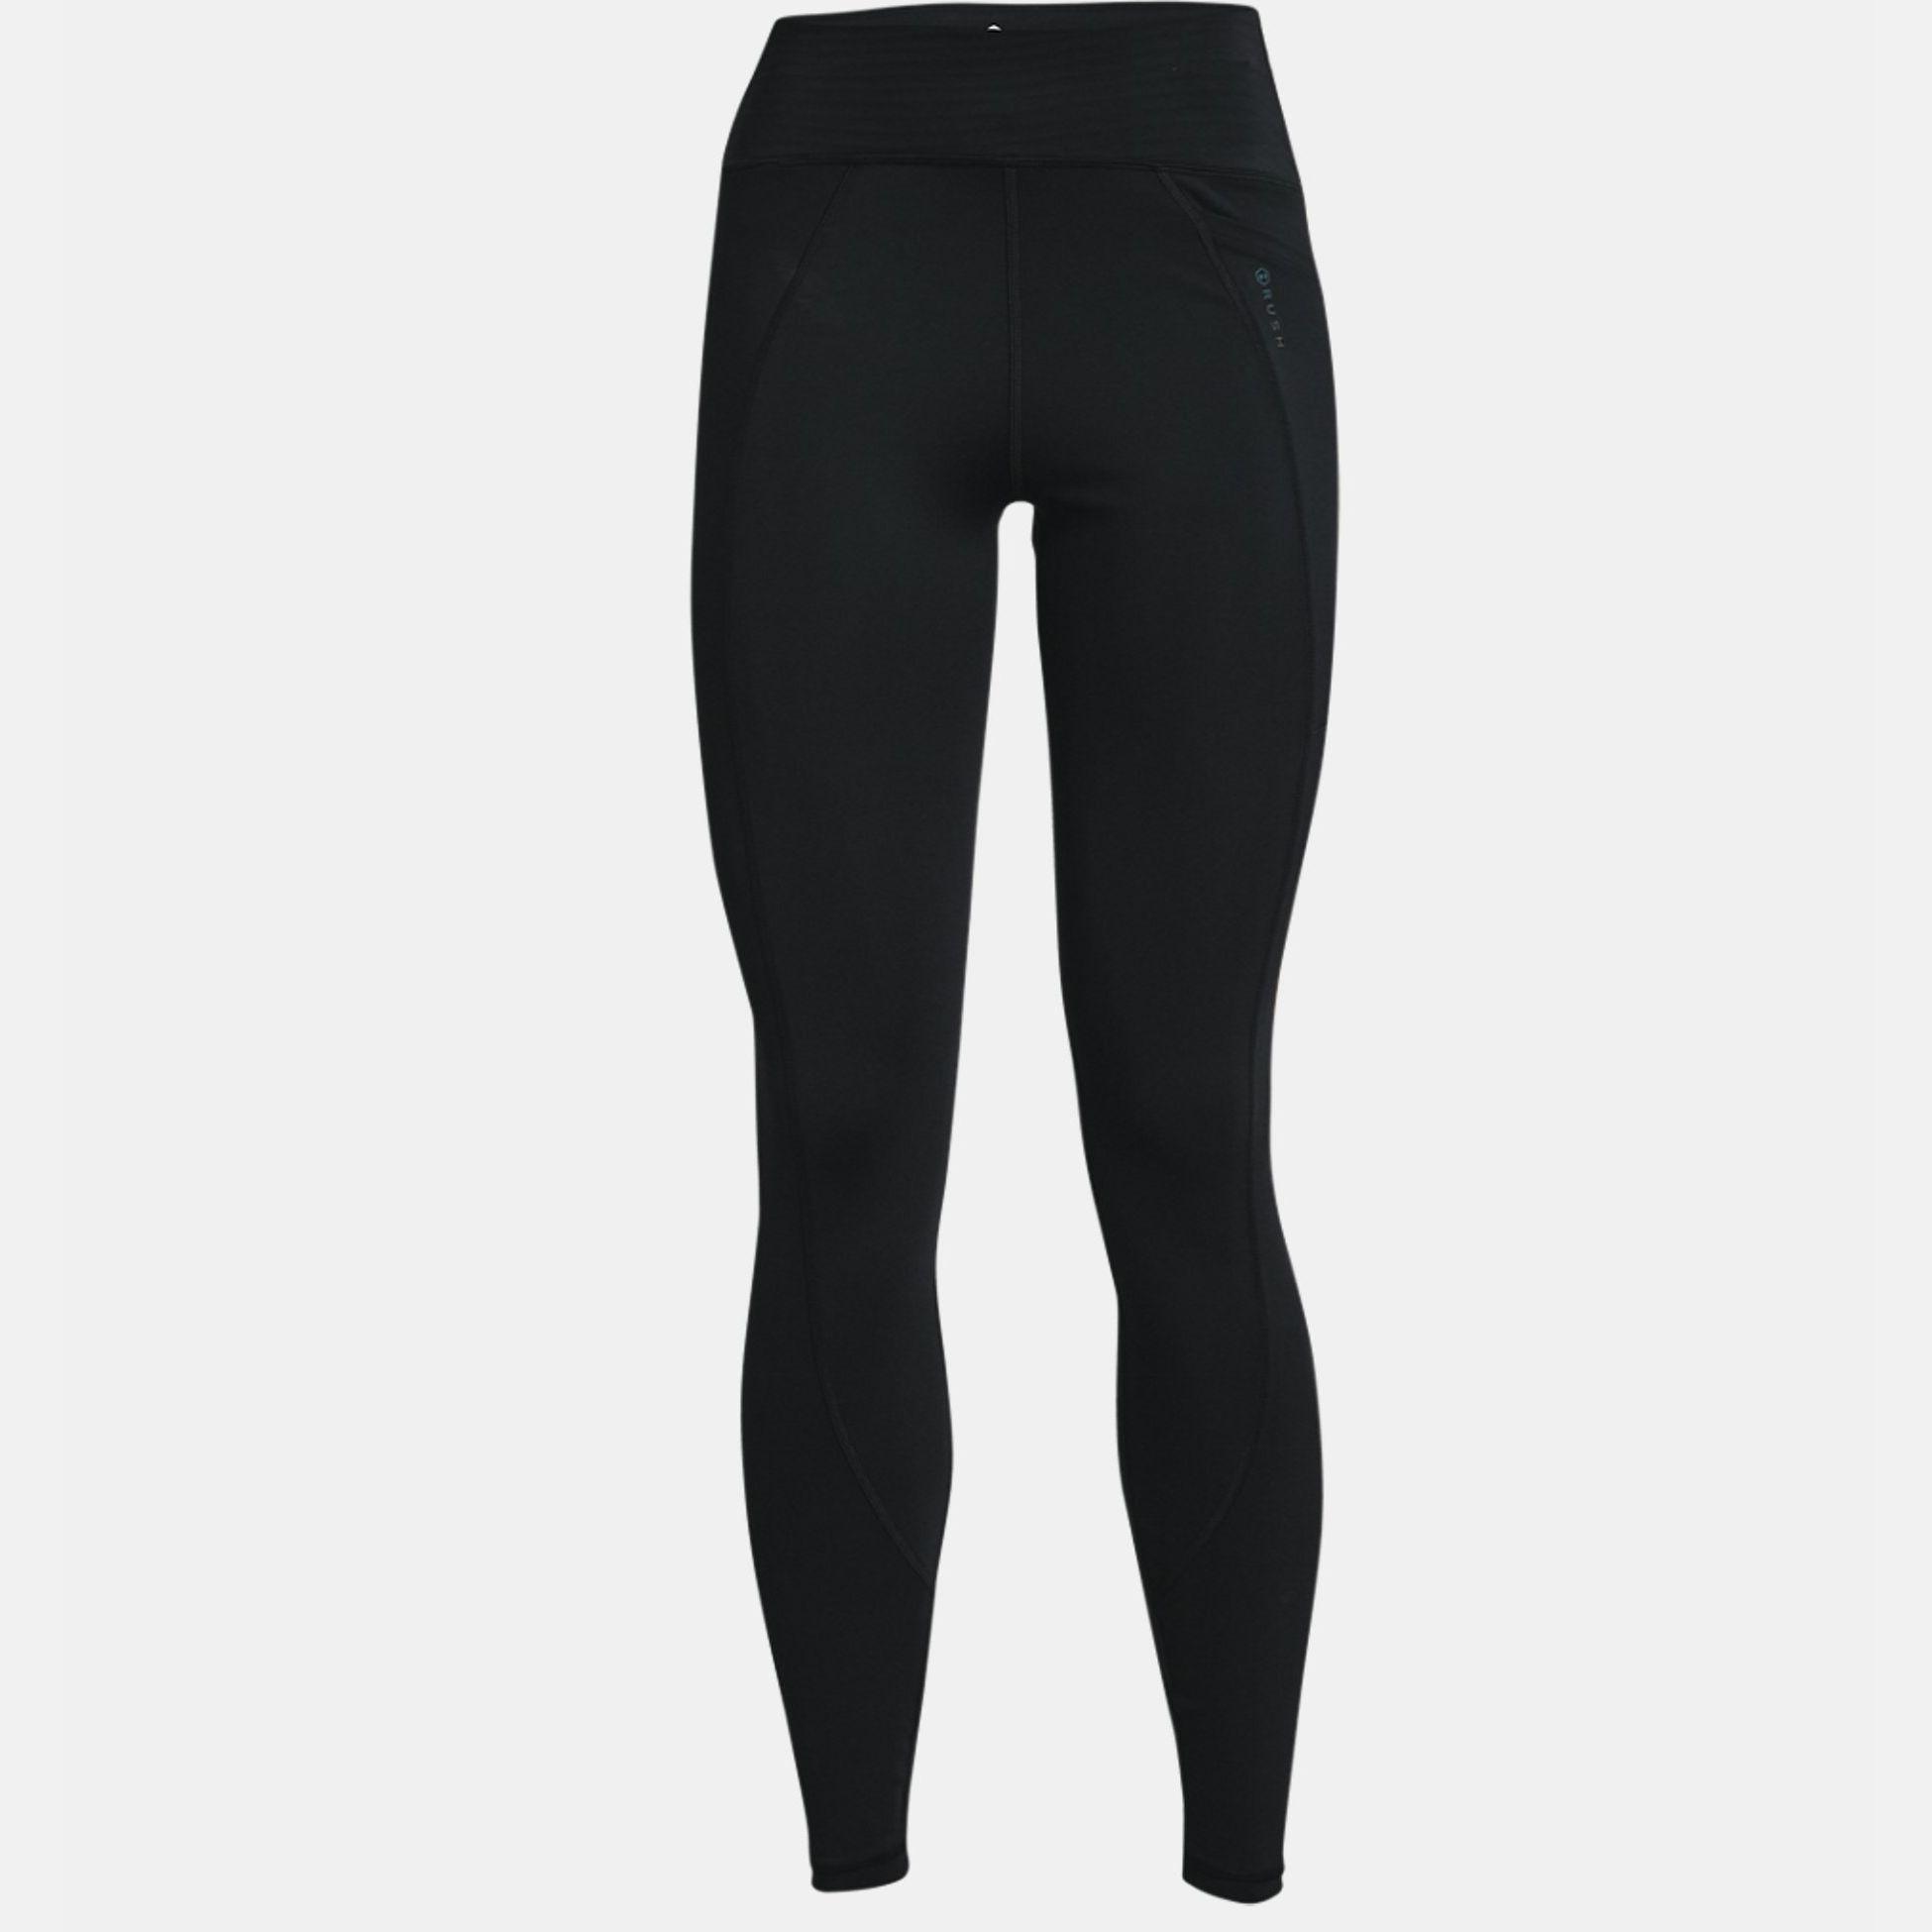 Clothing -  under armour UA RUSH No-Slip Waistband Leggings 8181